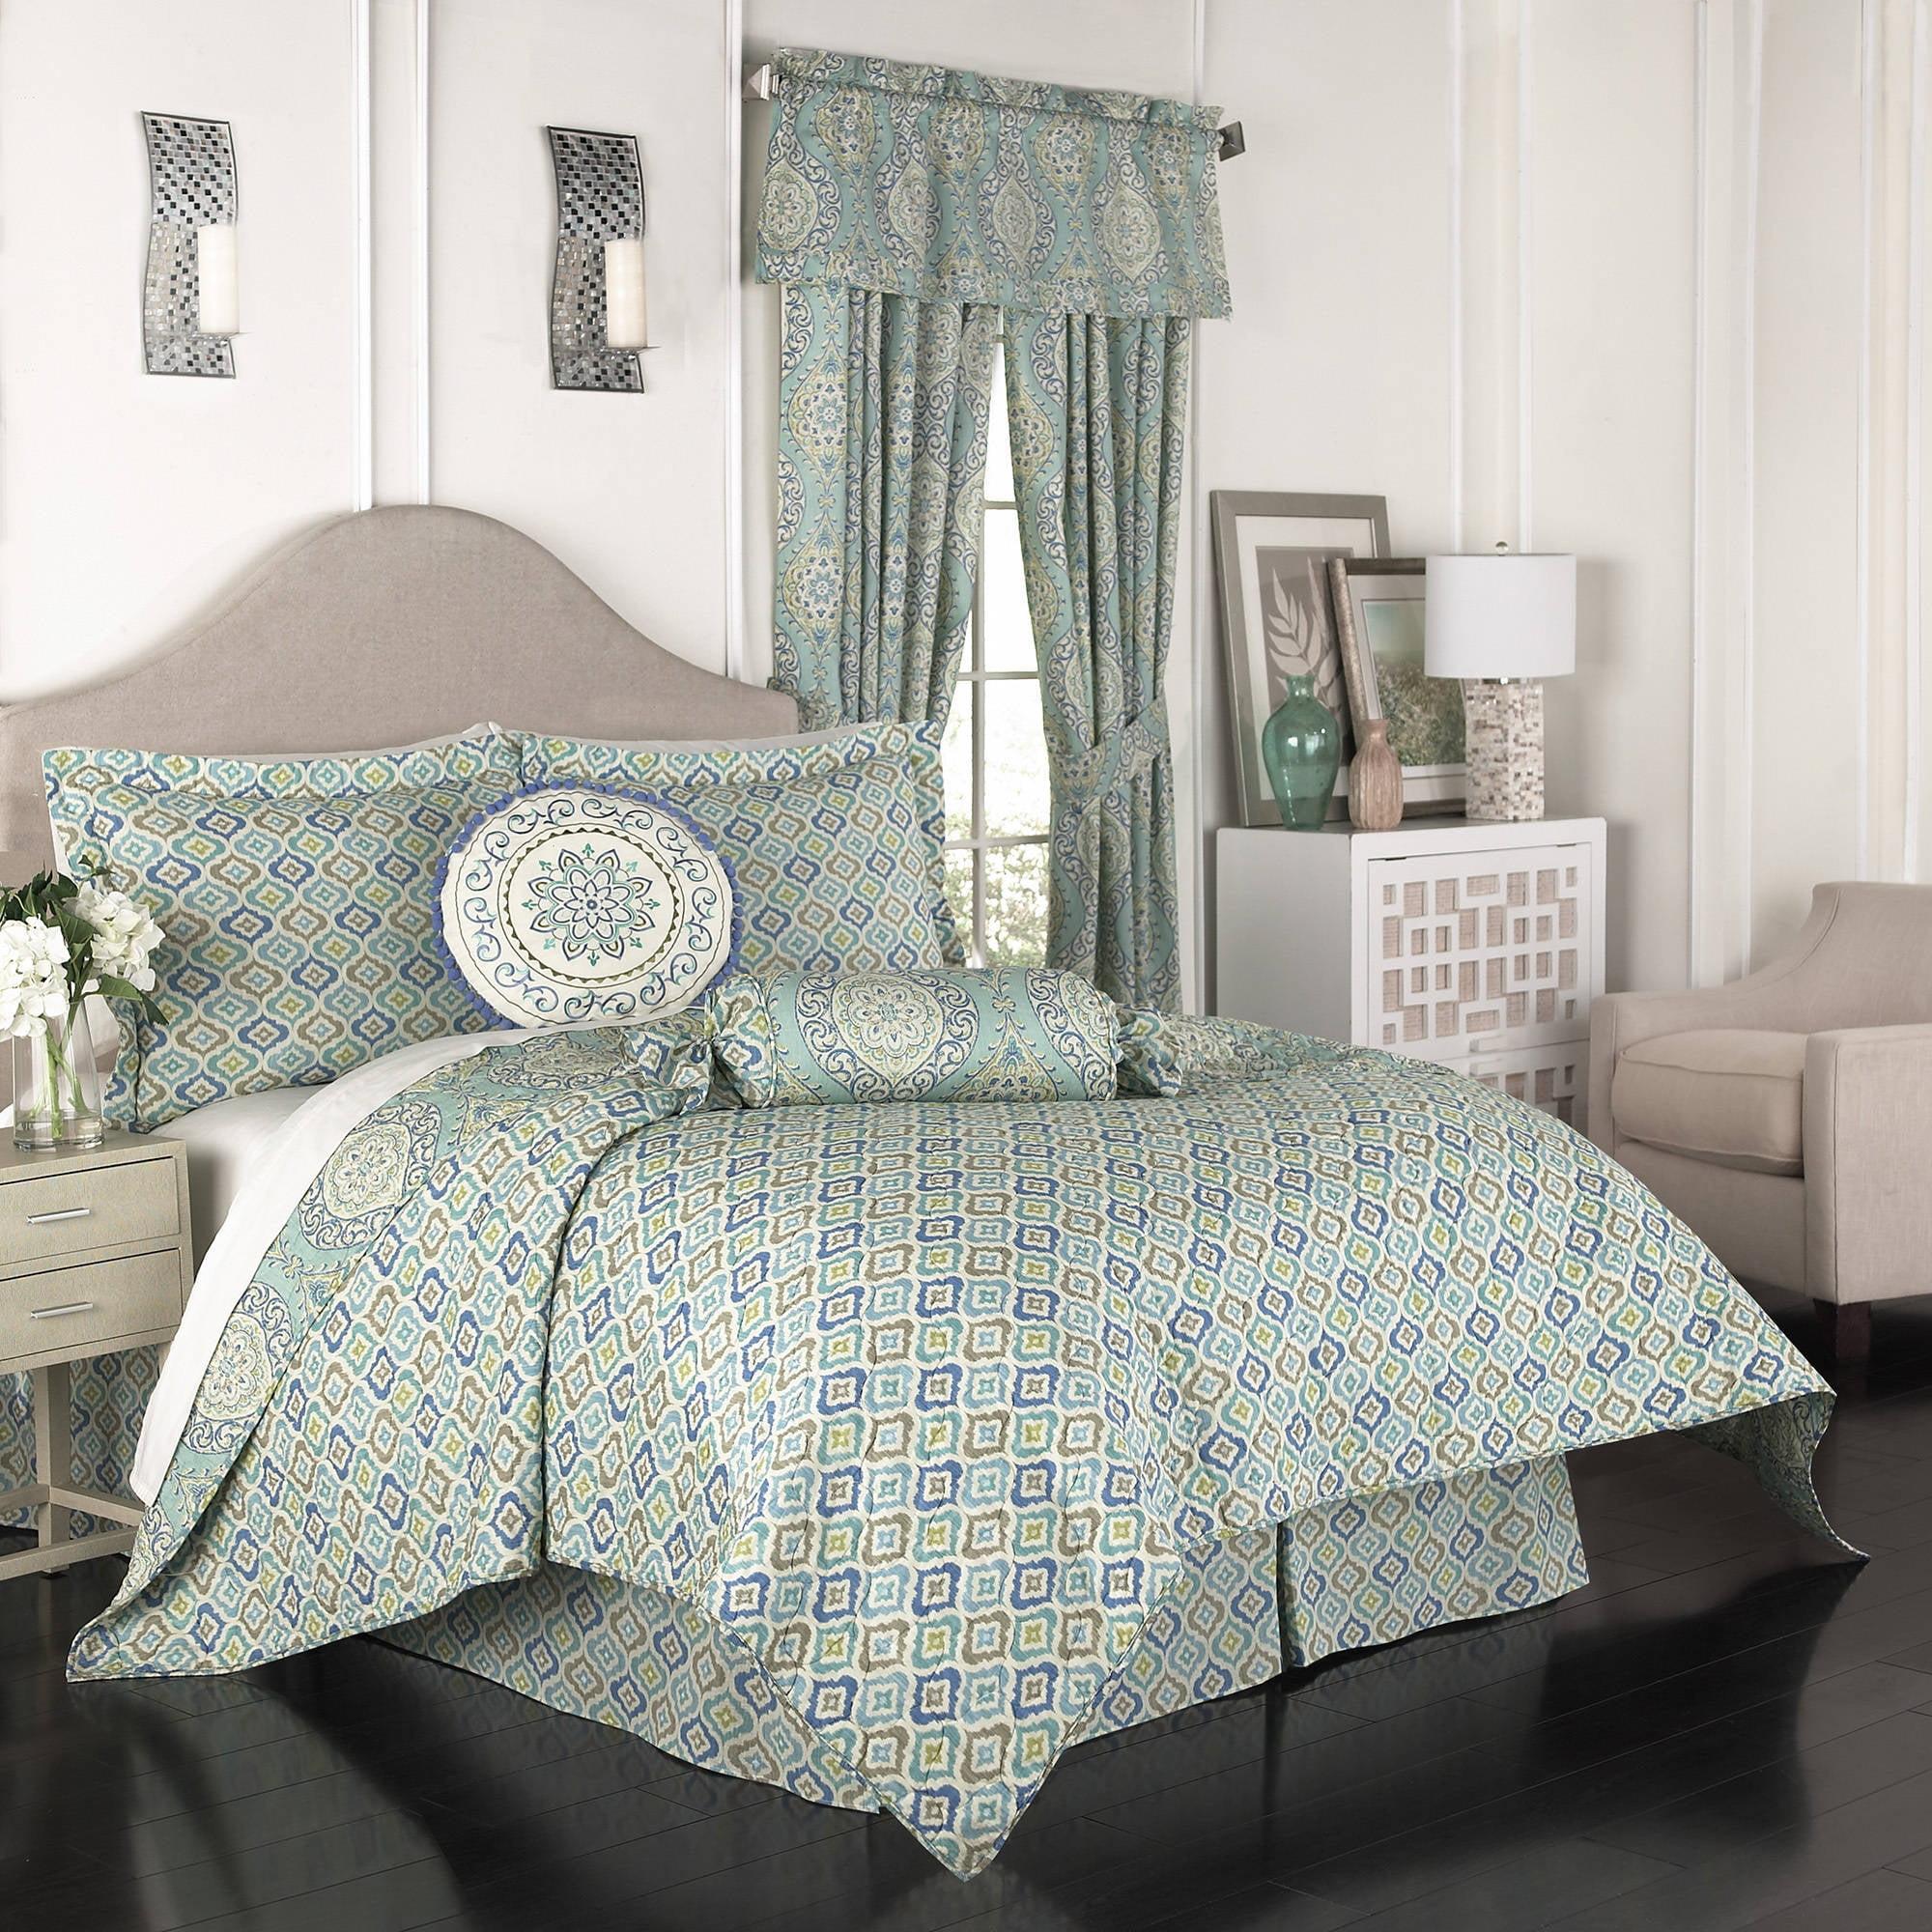 bath com grey set bedding and product design zara comforter geometric blue piece bed intelligent overstock